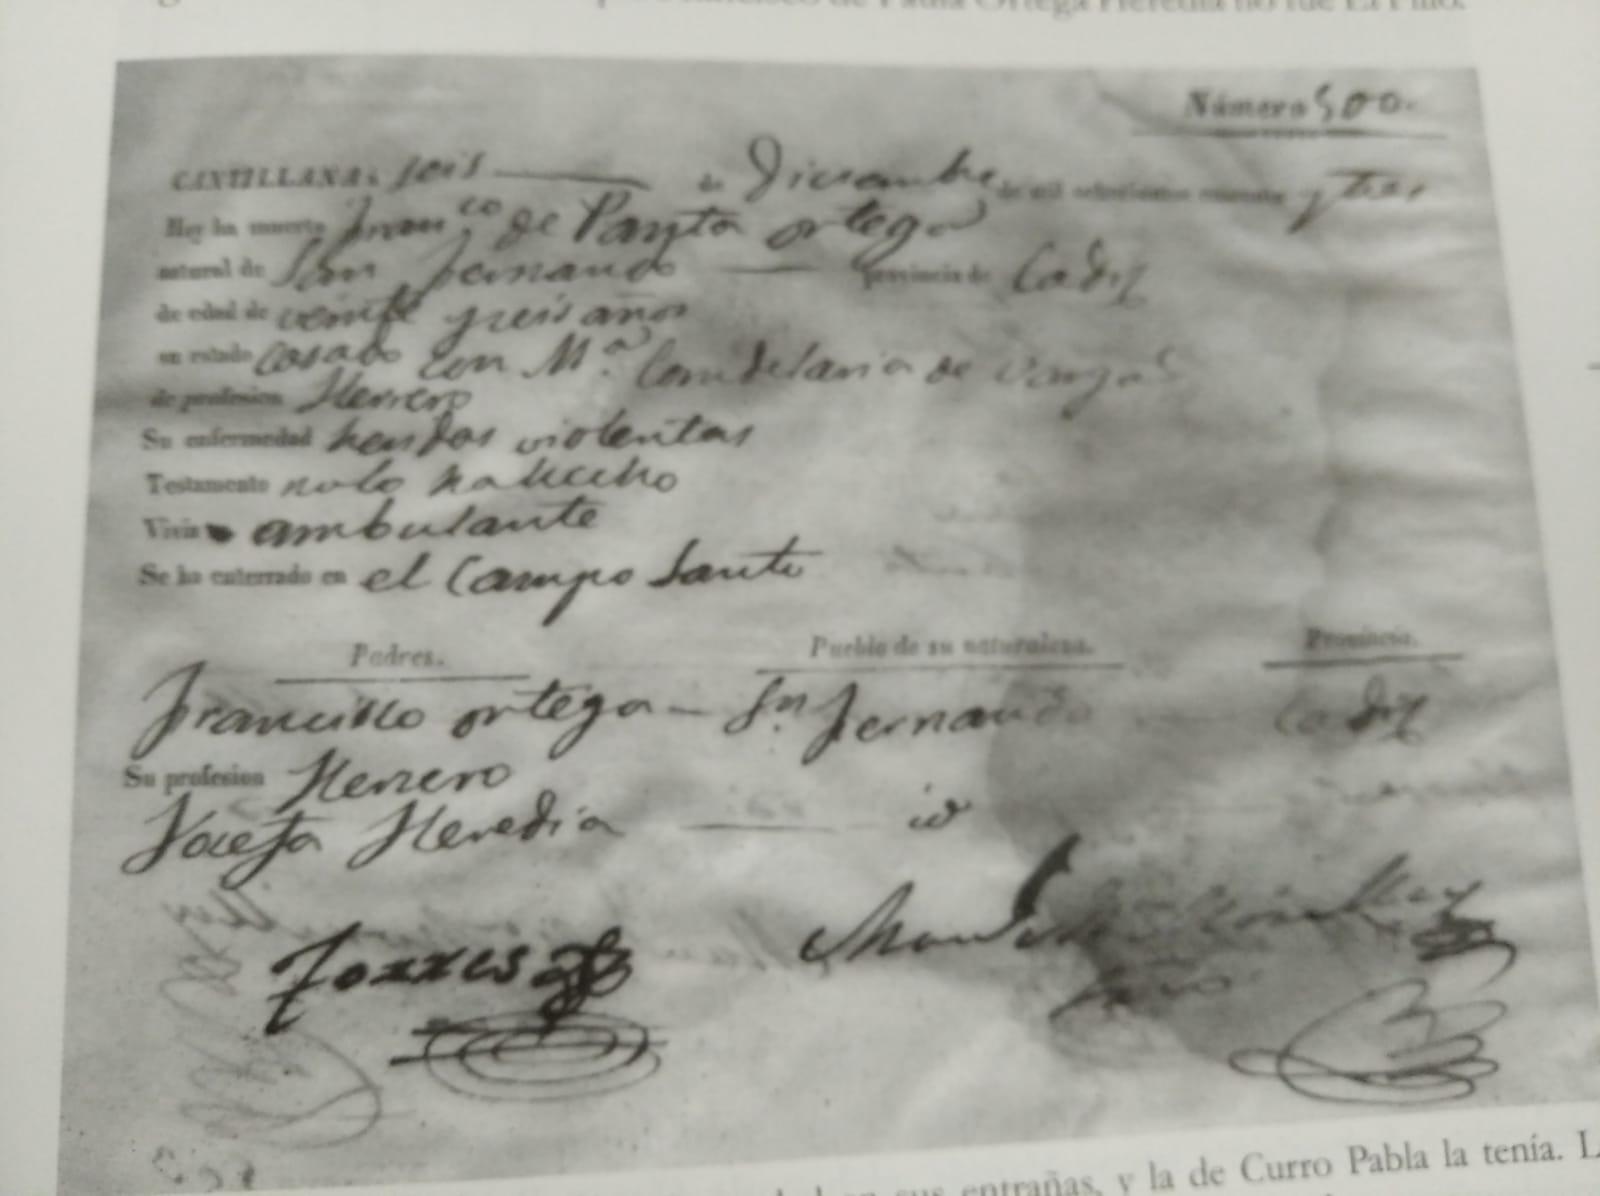 Muerte de Curro Pabla. Cantillana, 1843. Archivo Luis Javier Vázquez Morilla.